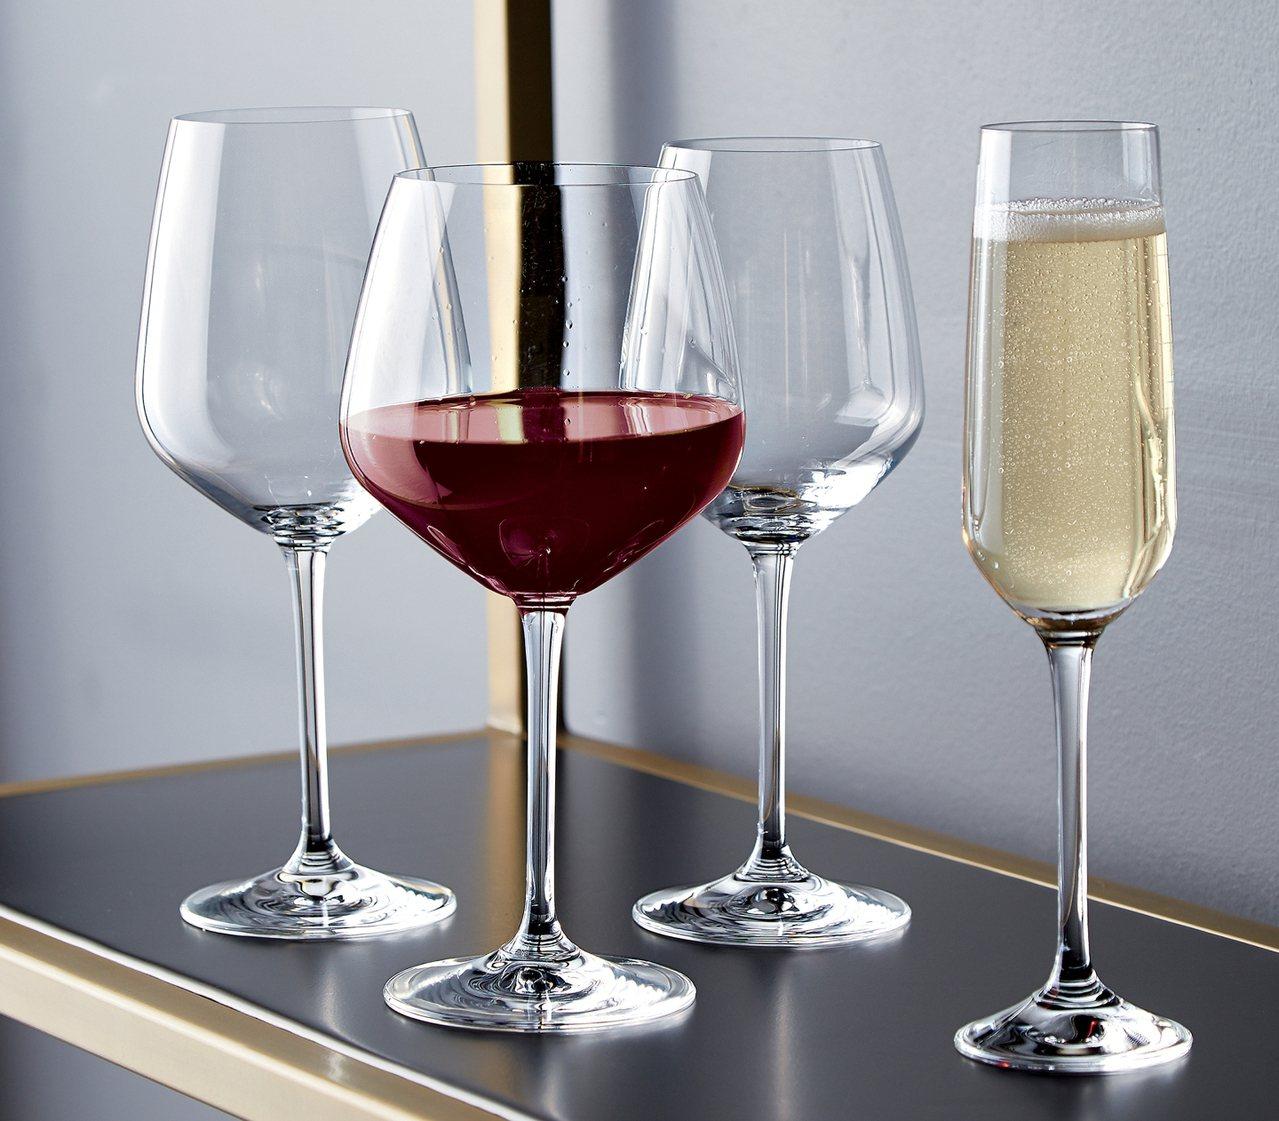 Nattie酒杯有著鬱金香輪廓的杯體呈現摩登的弧線角度。圖/Crate and ...